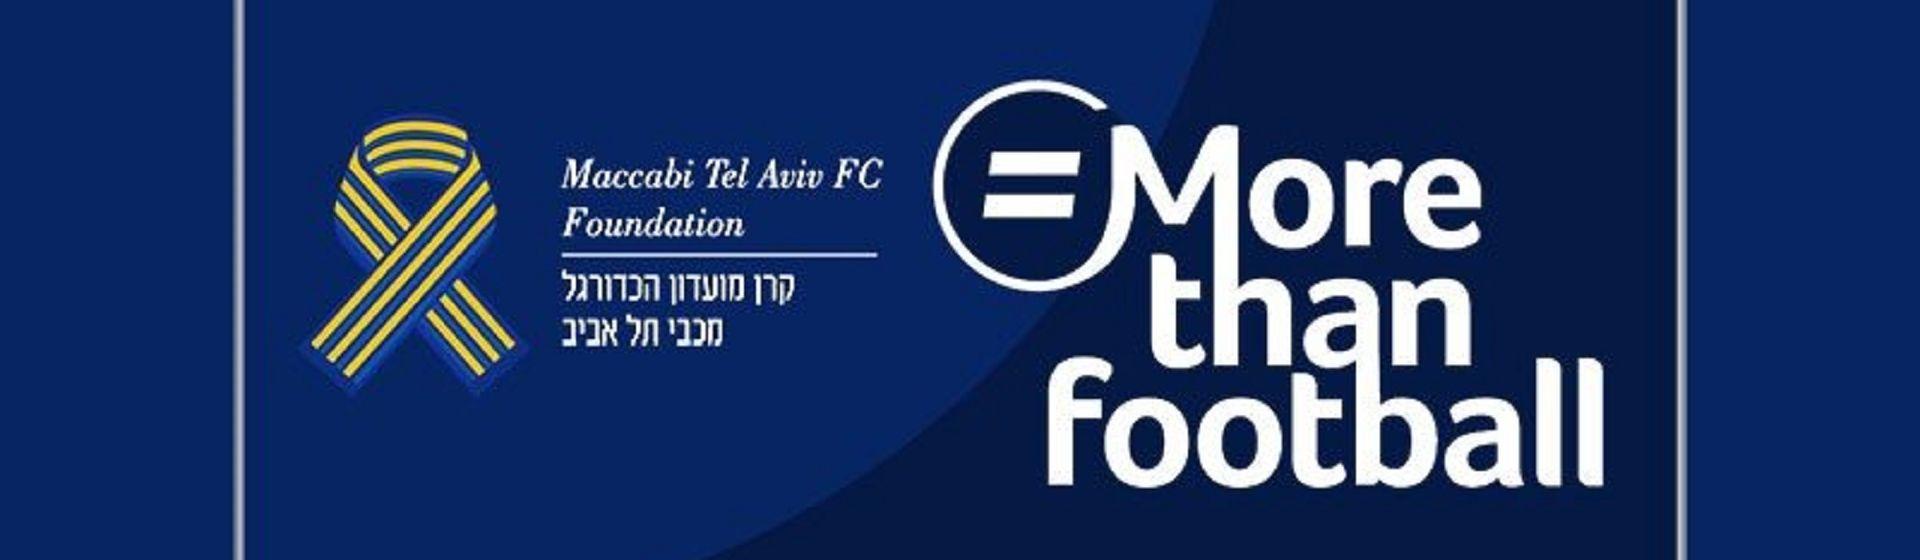 Maccabi Tel Aviv FC Foundation